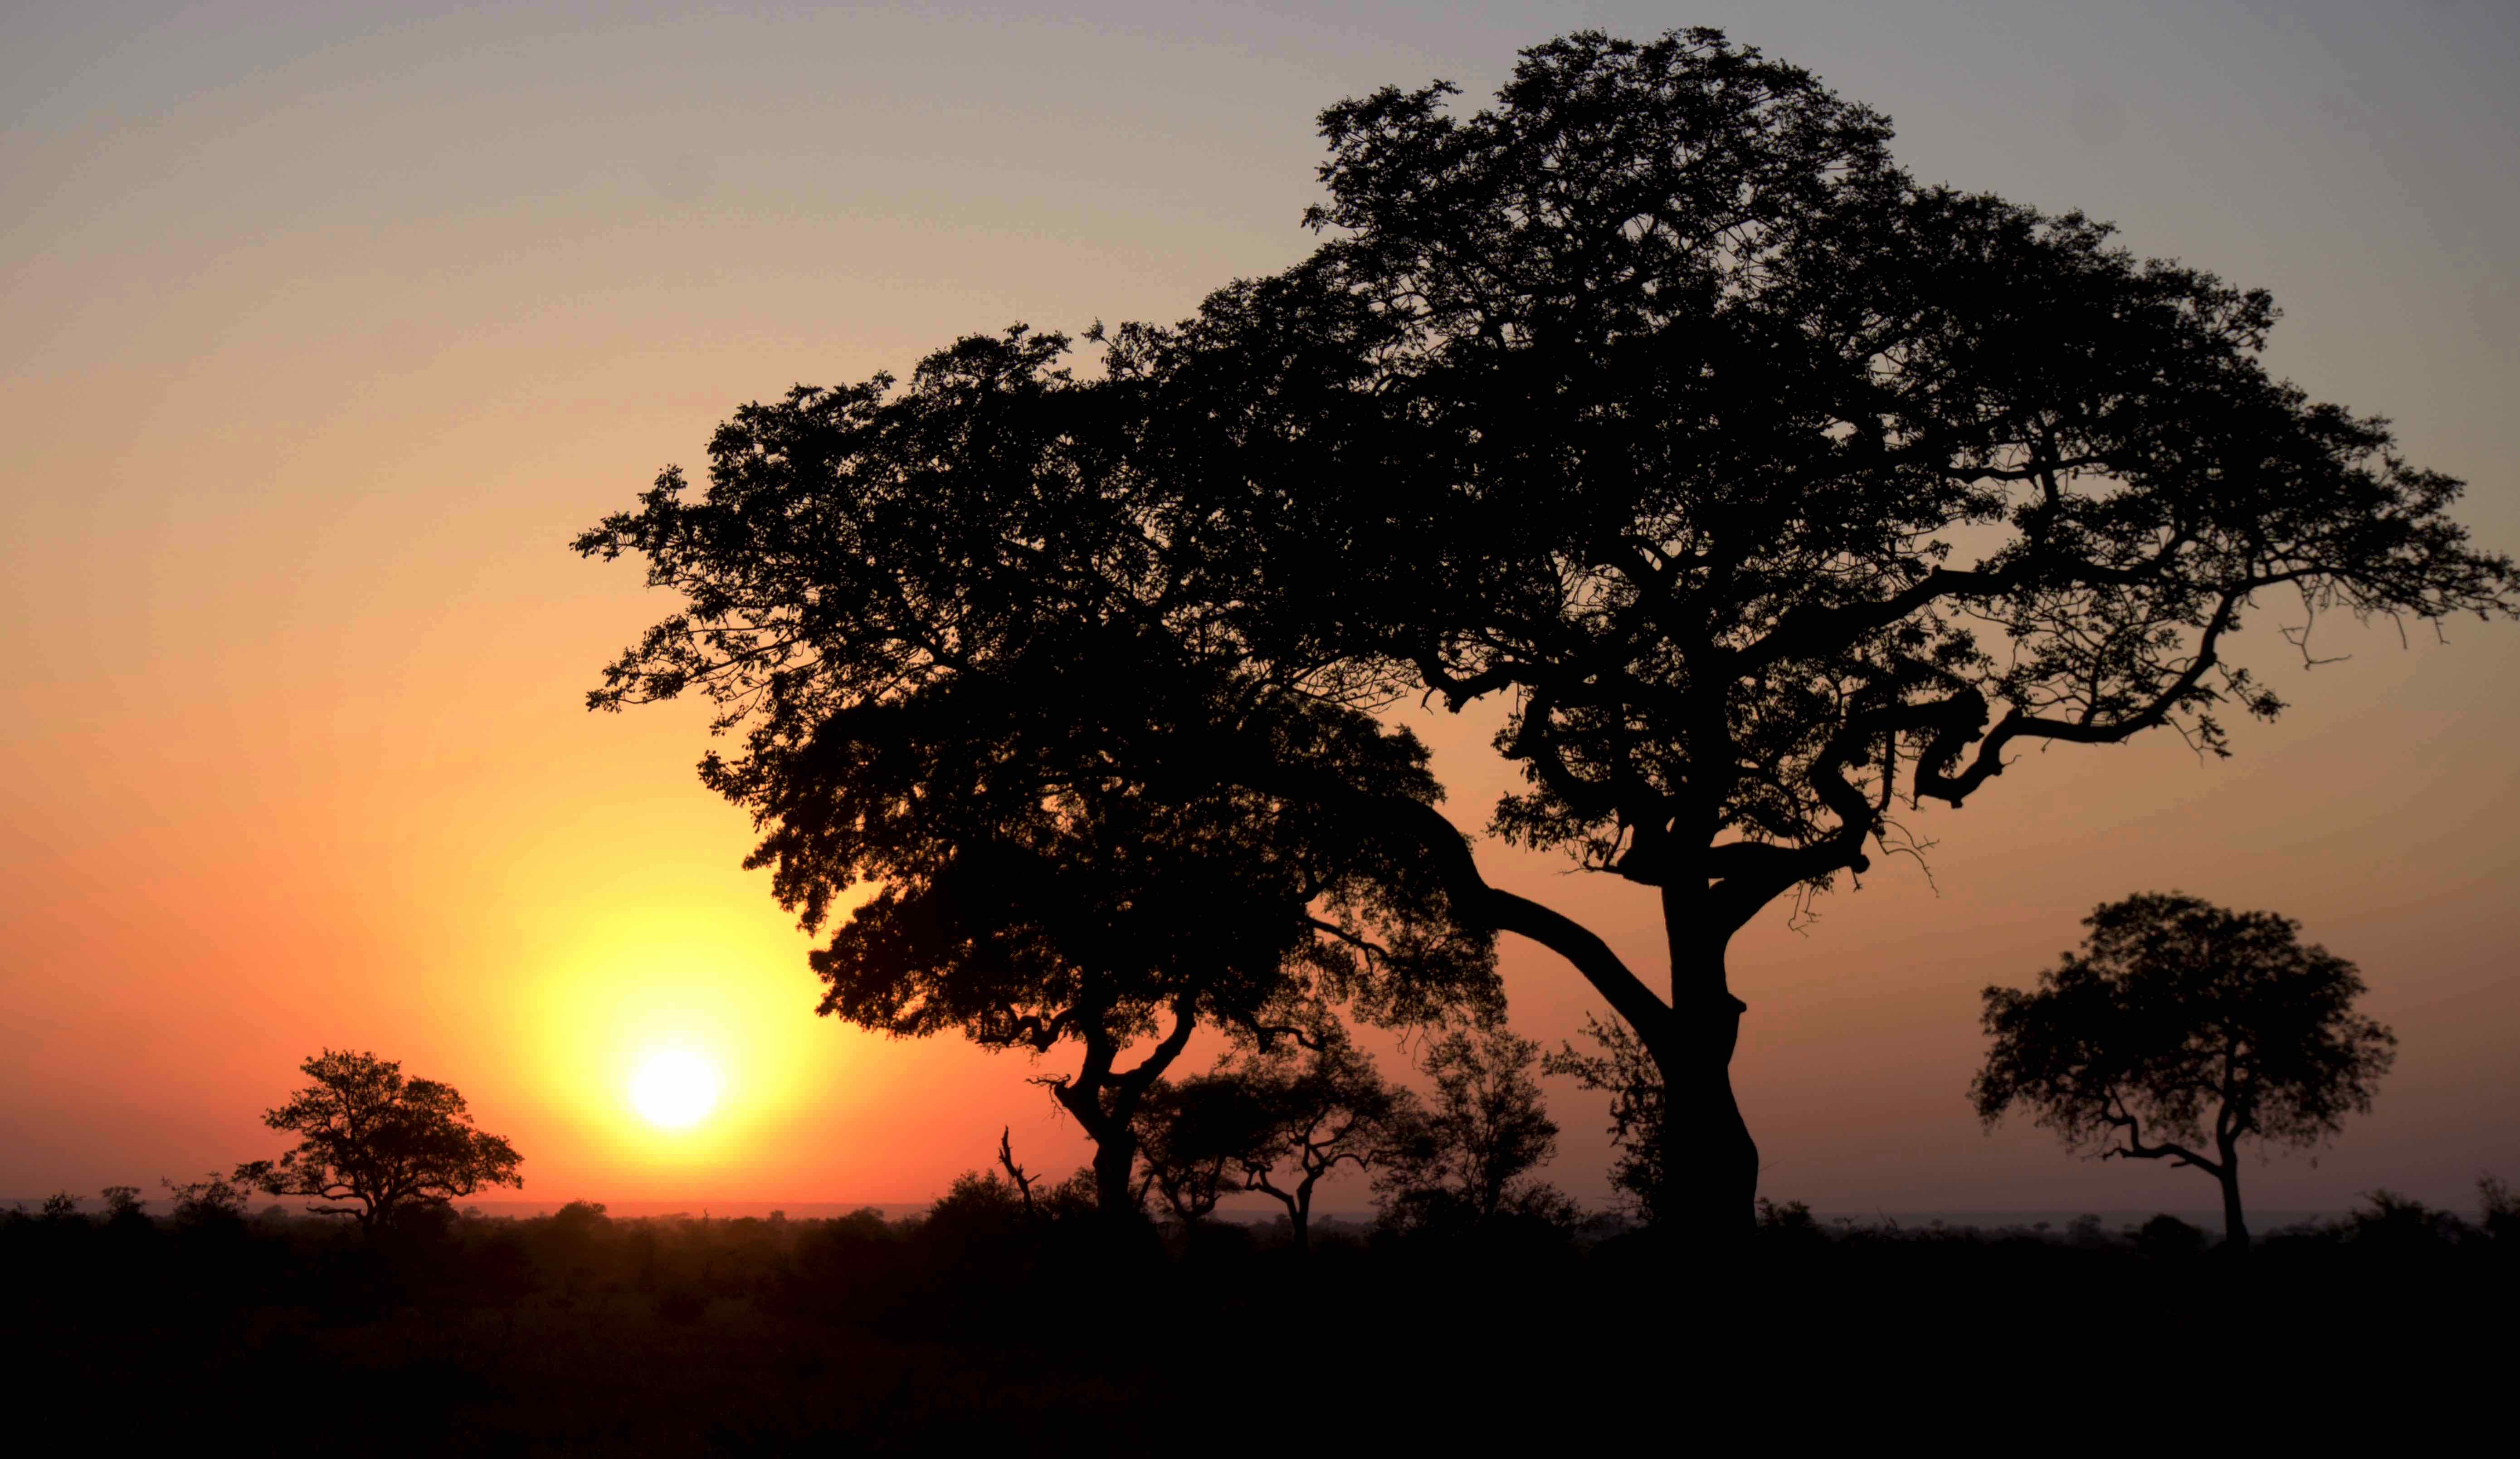 Itinerario SUDAFRICA fai da te: 1 PARTE